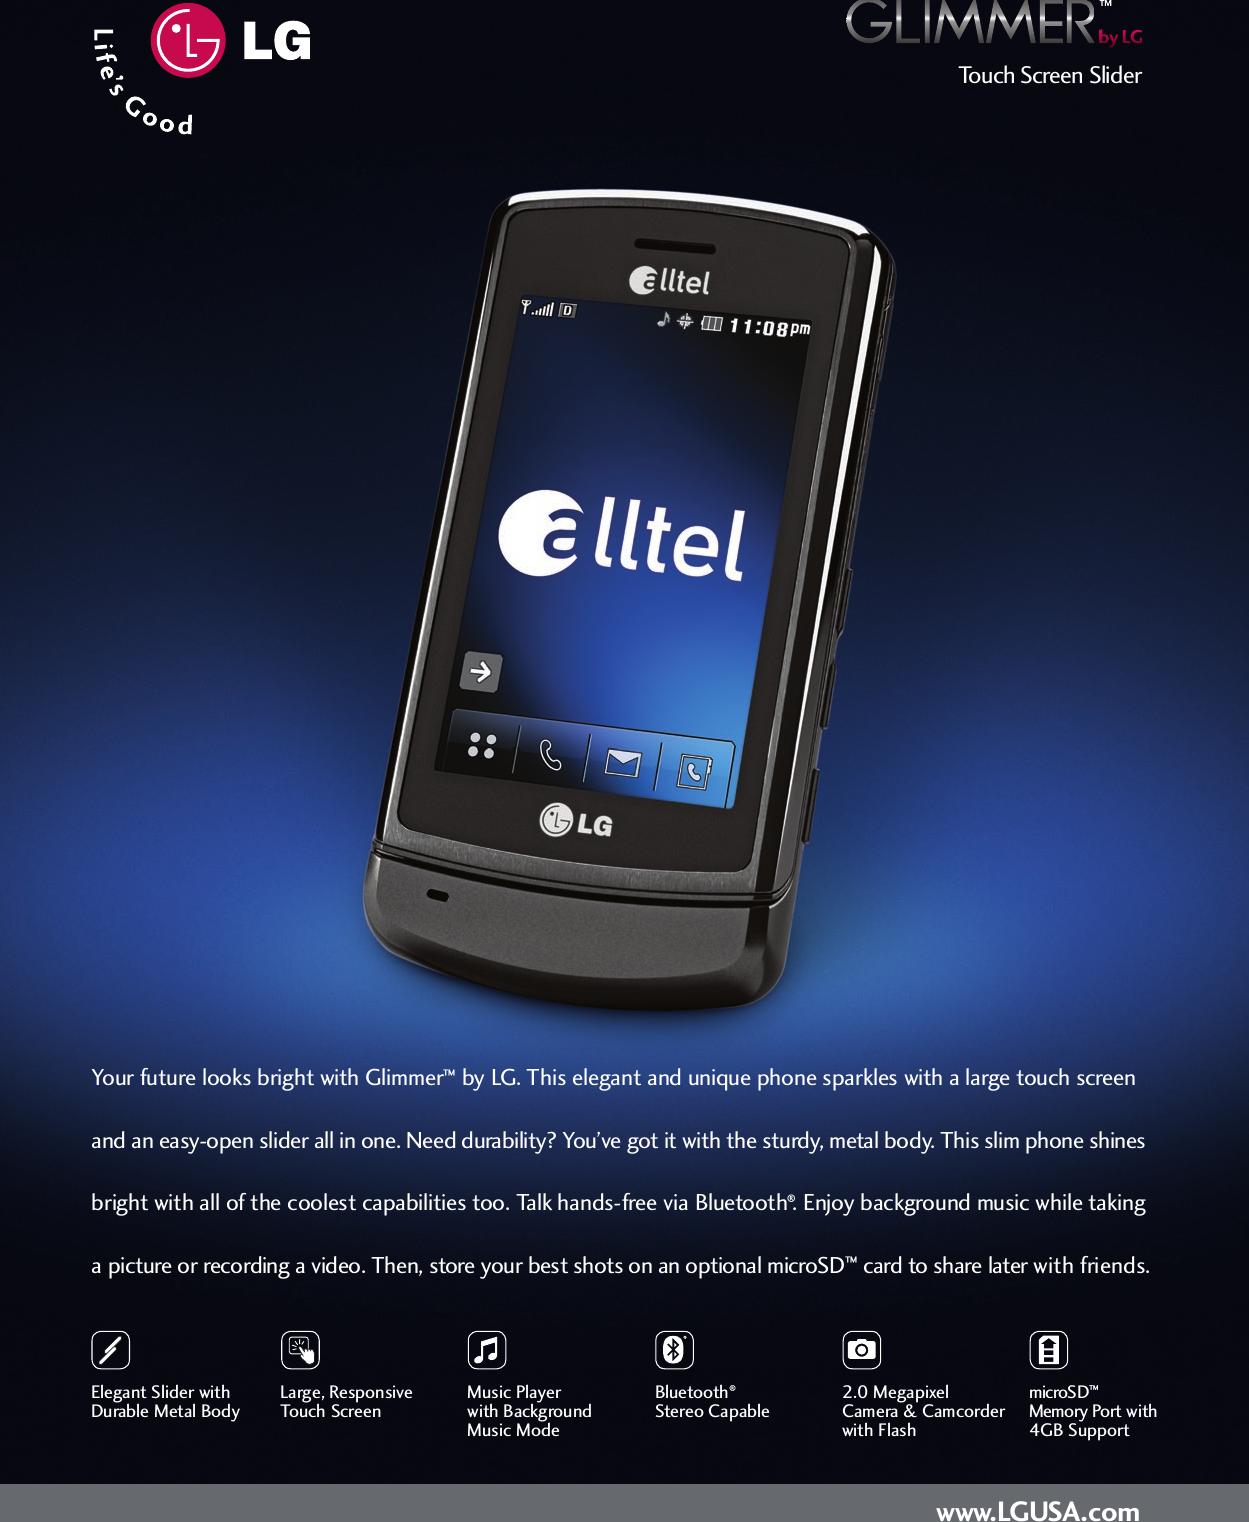 lg ax830 user manual data sheet datasheet rh usermanual wiki LG Phones Manual LG Phones Manual